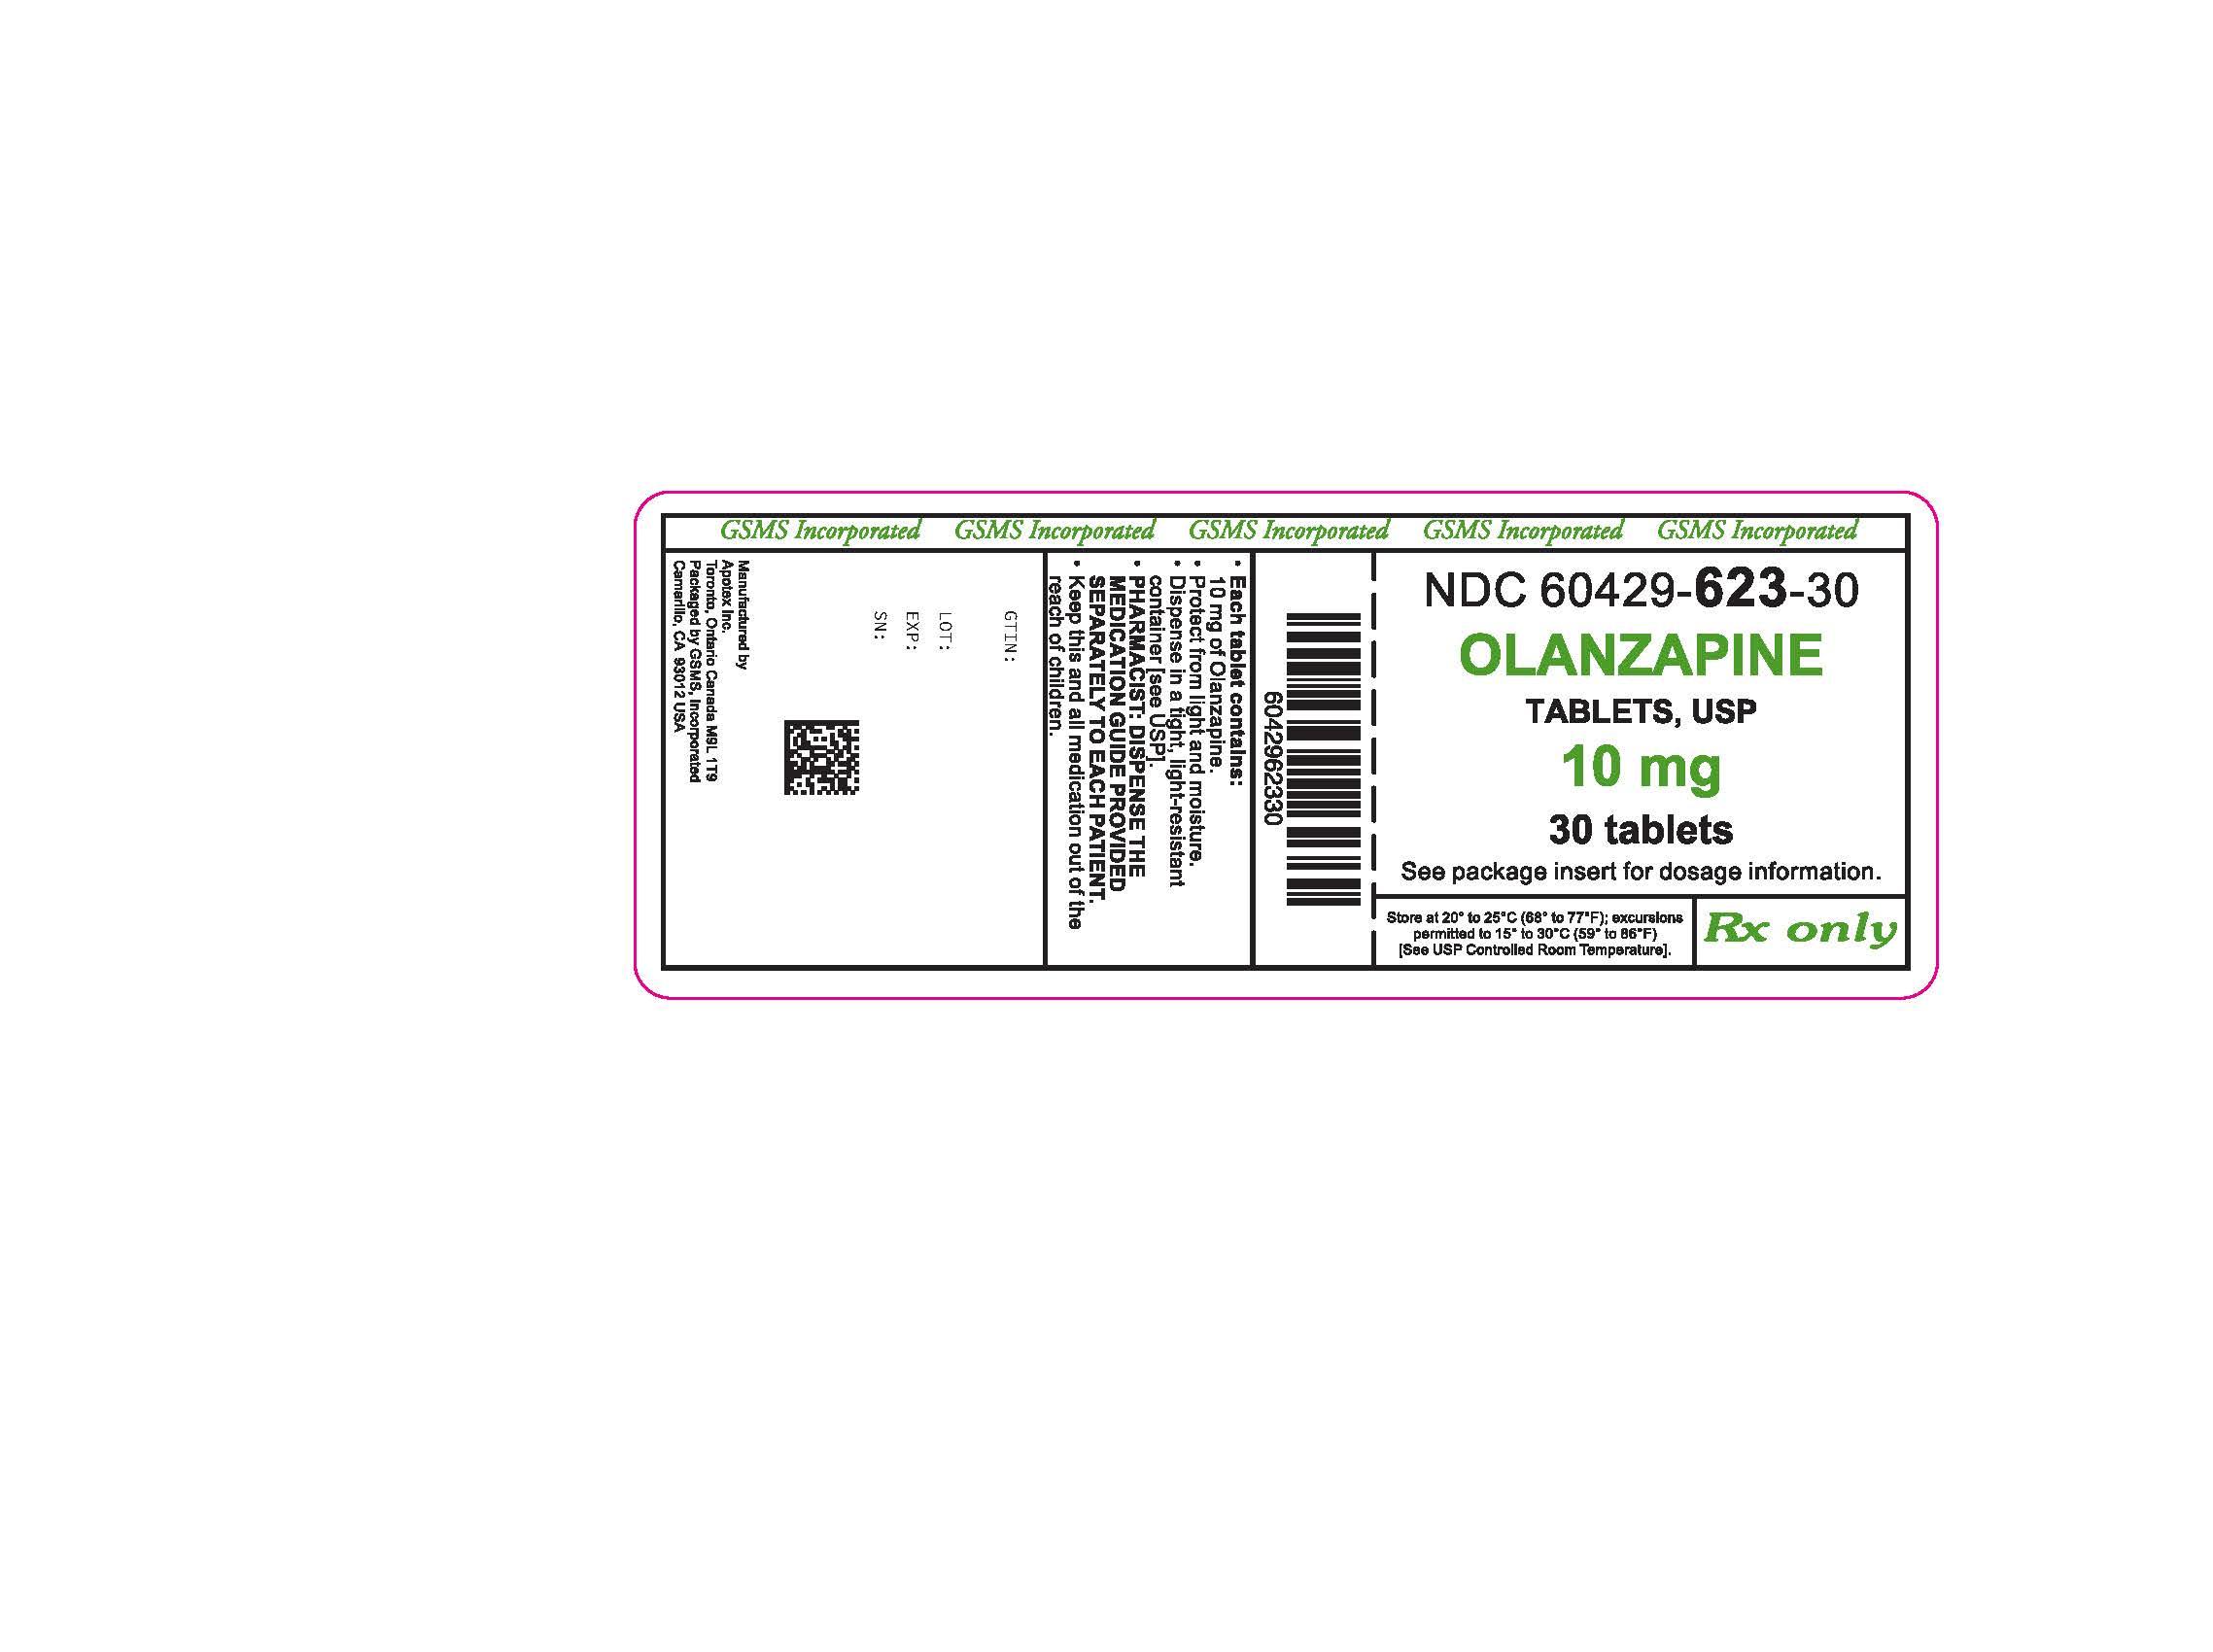 60429-623-30LB OLANZAPINE 10MG TABS.jpg